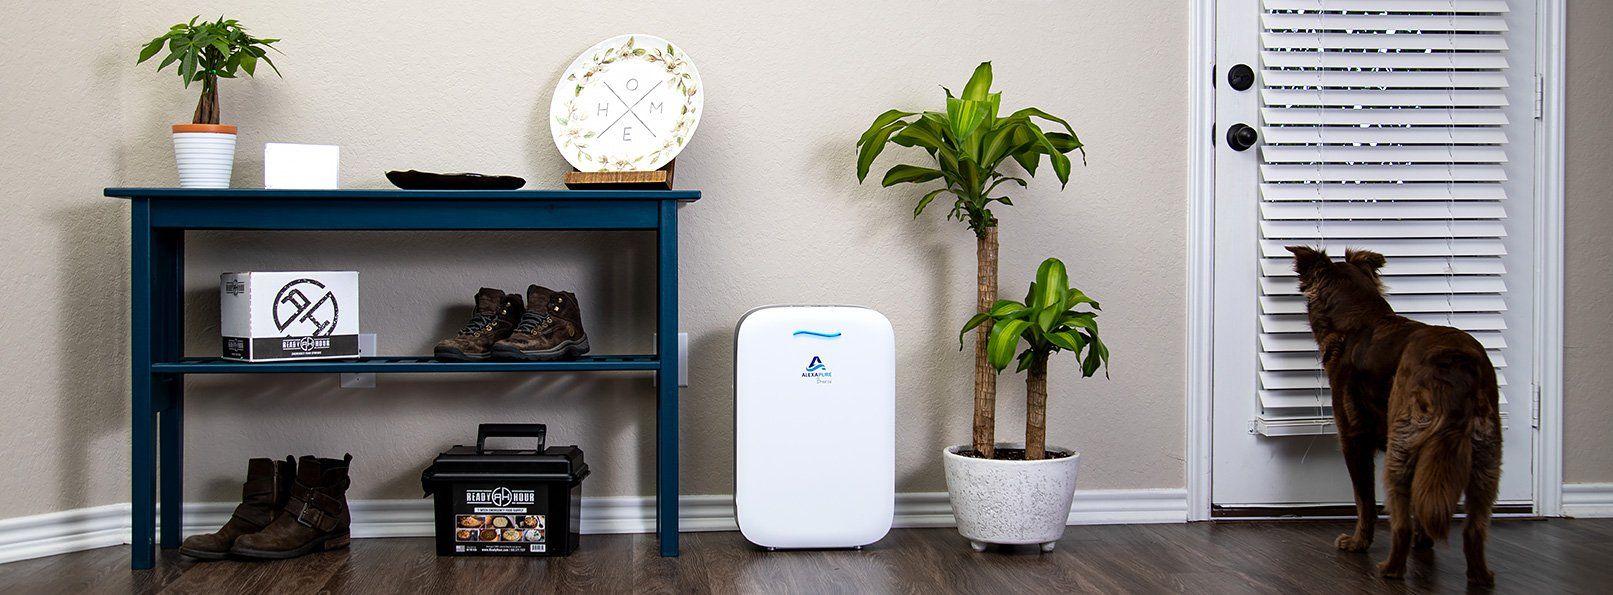 Alexapure Breeze True HEPA Air Purifier in 2020 Hepa air